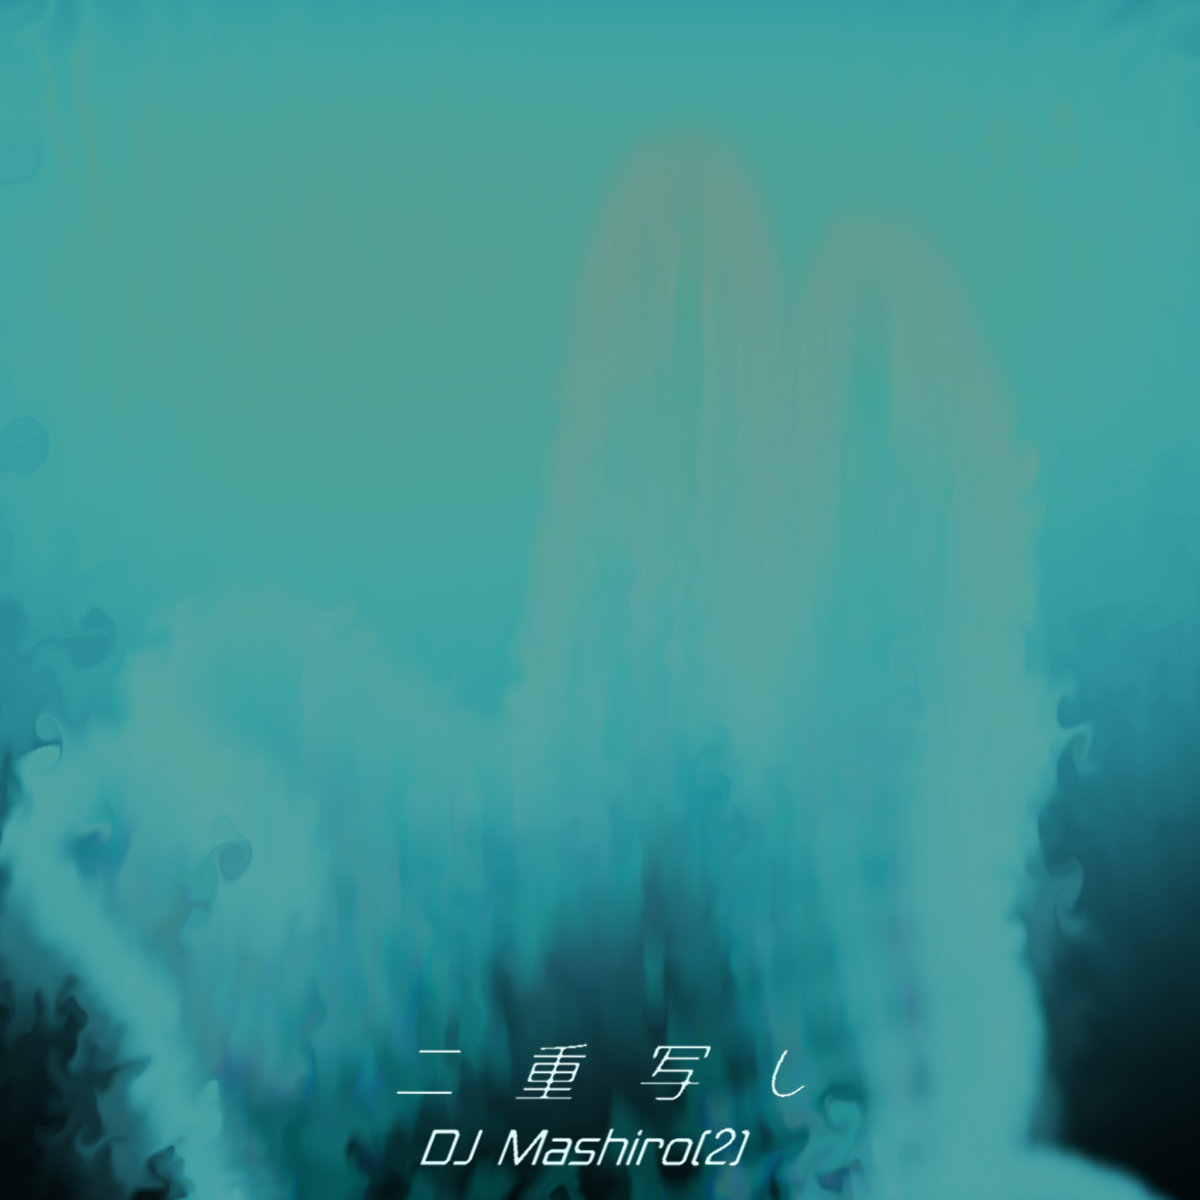 DJ Mashiro (2) – 二重写し